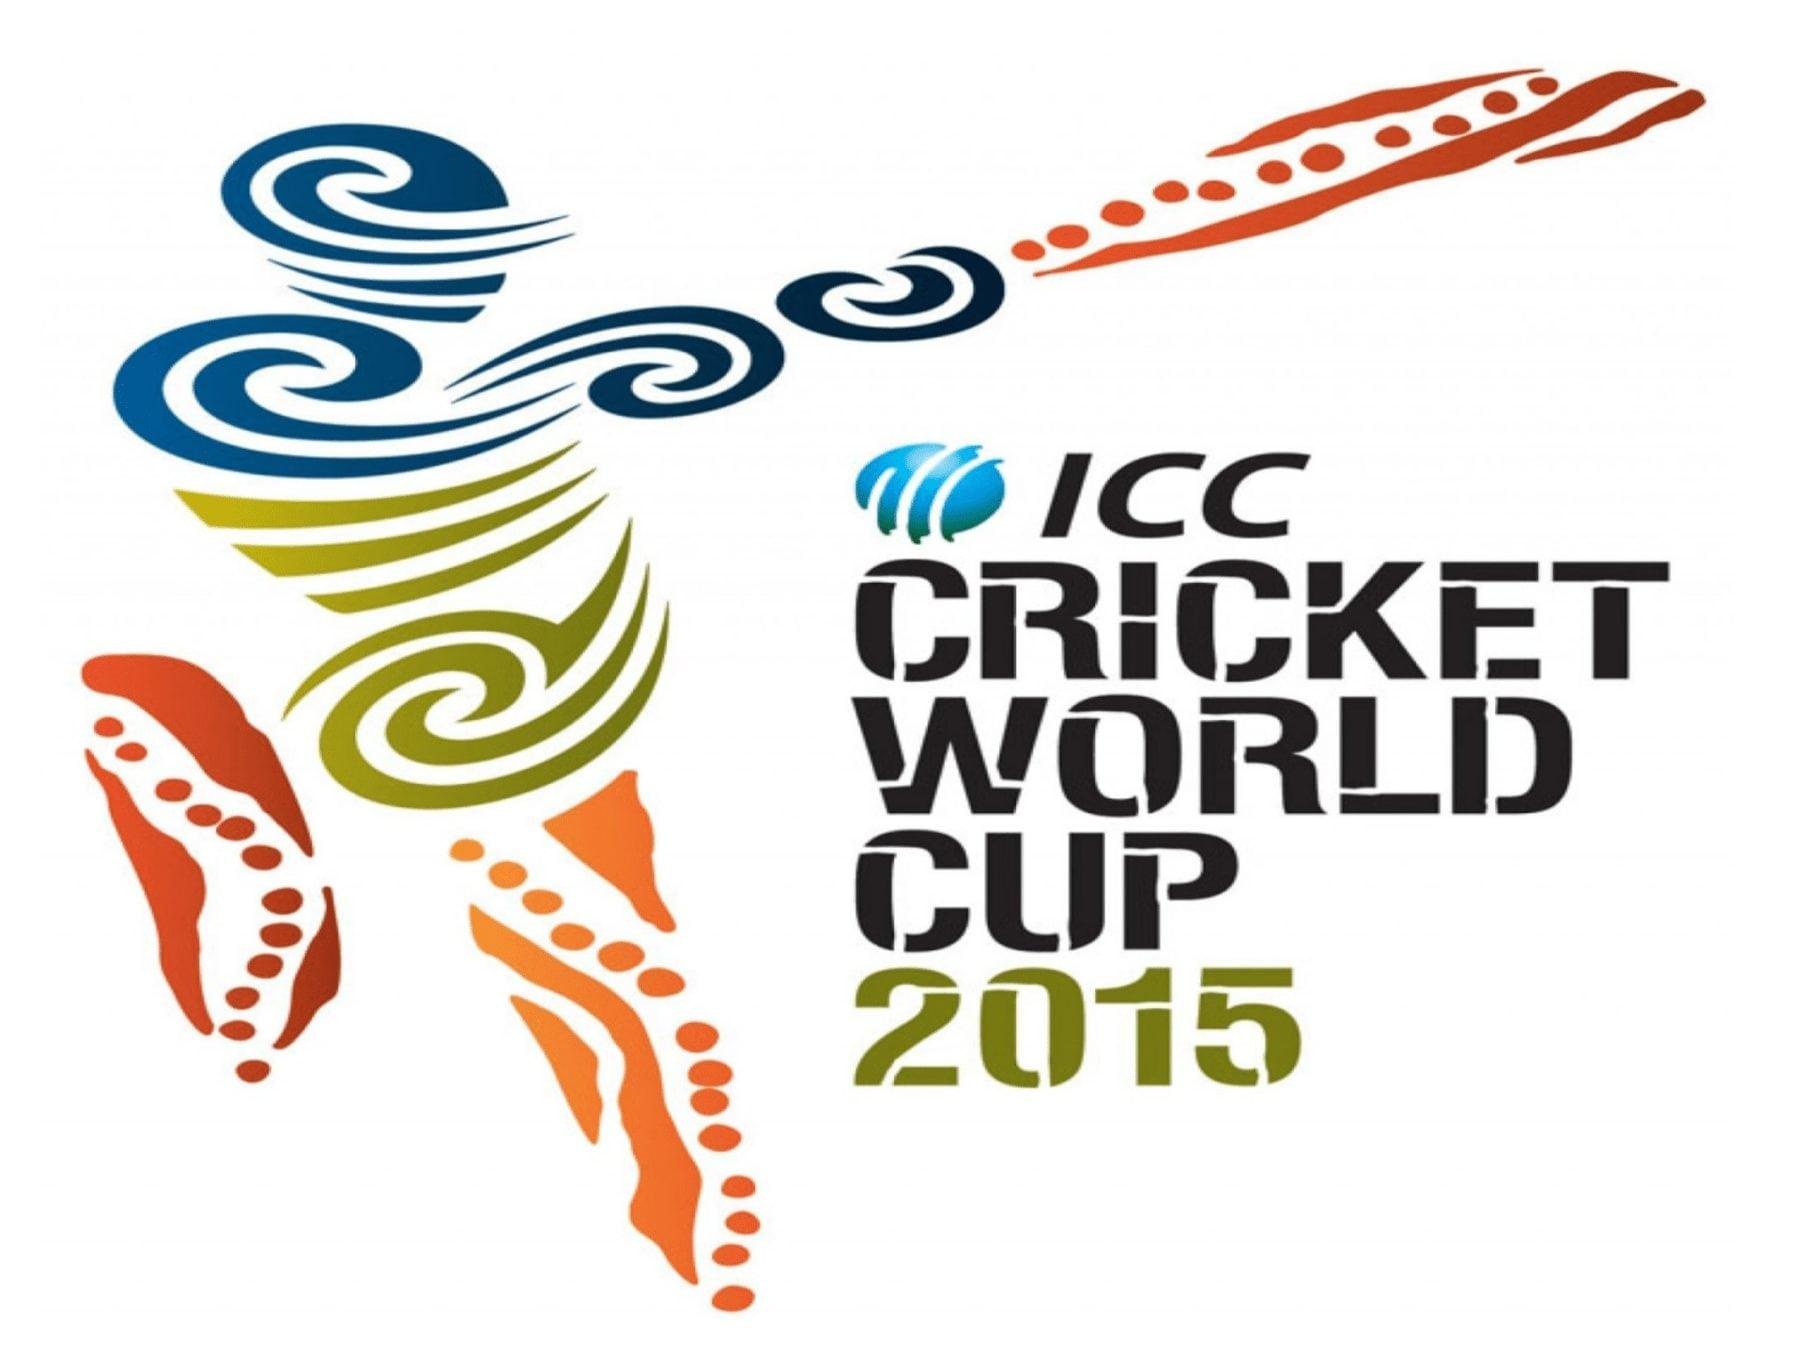 cricket world cup 2015 wallpaper